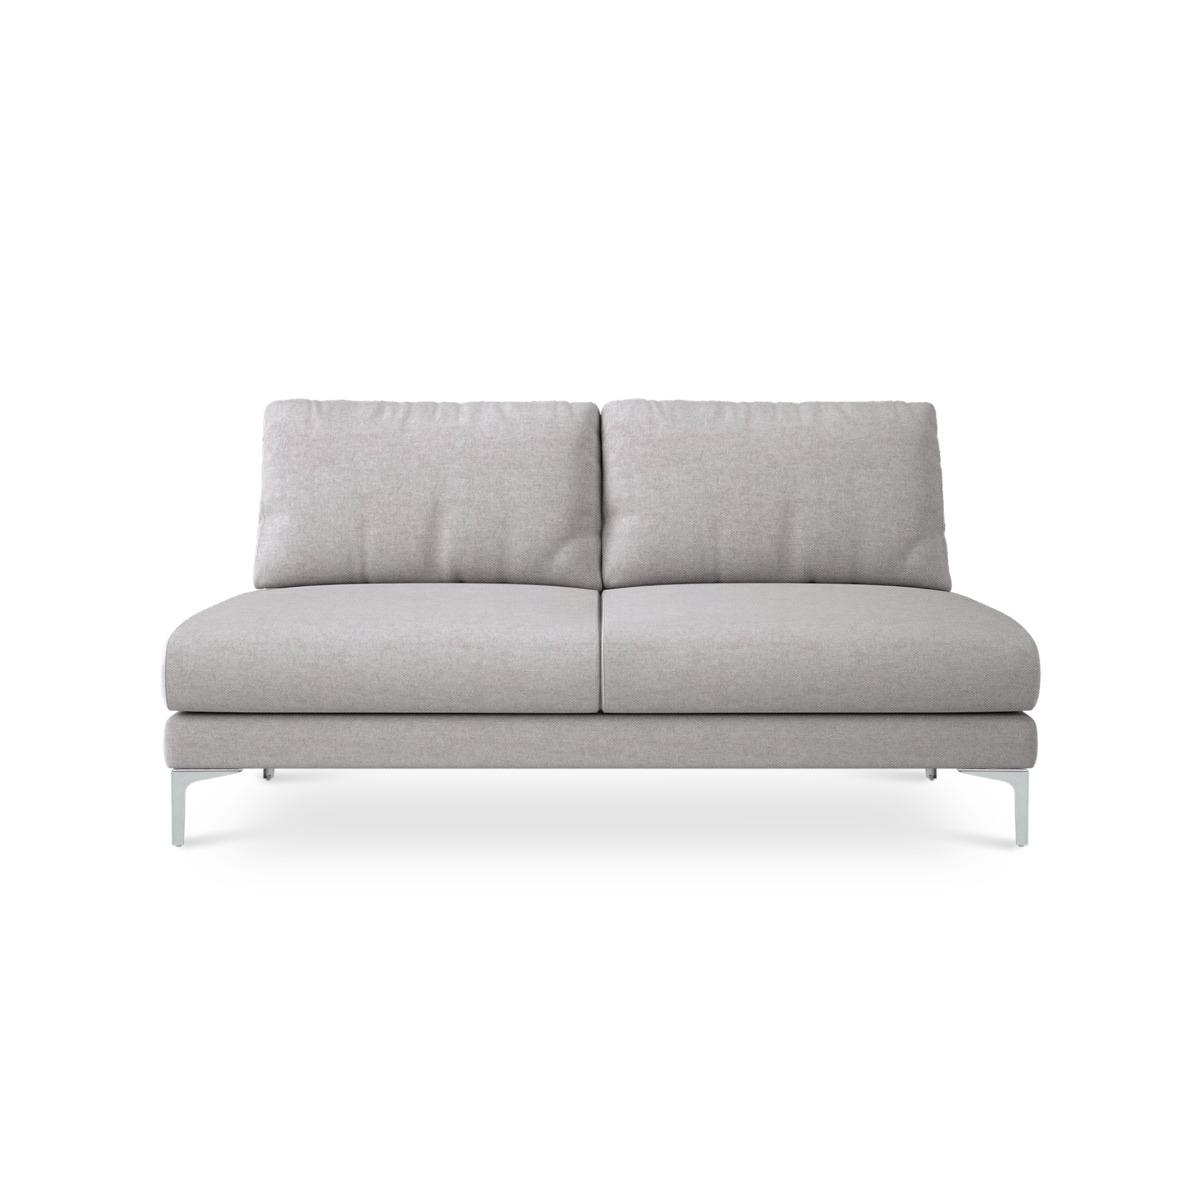 Adams Armless 2 Seater Sofa Customized, Parchment Beige (Silver Leg)